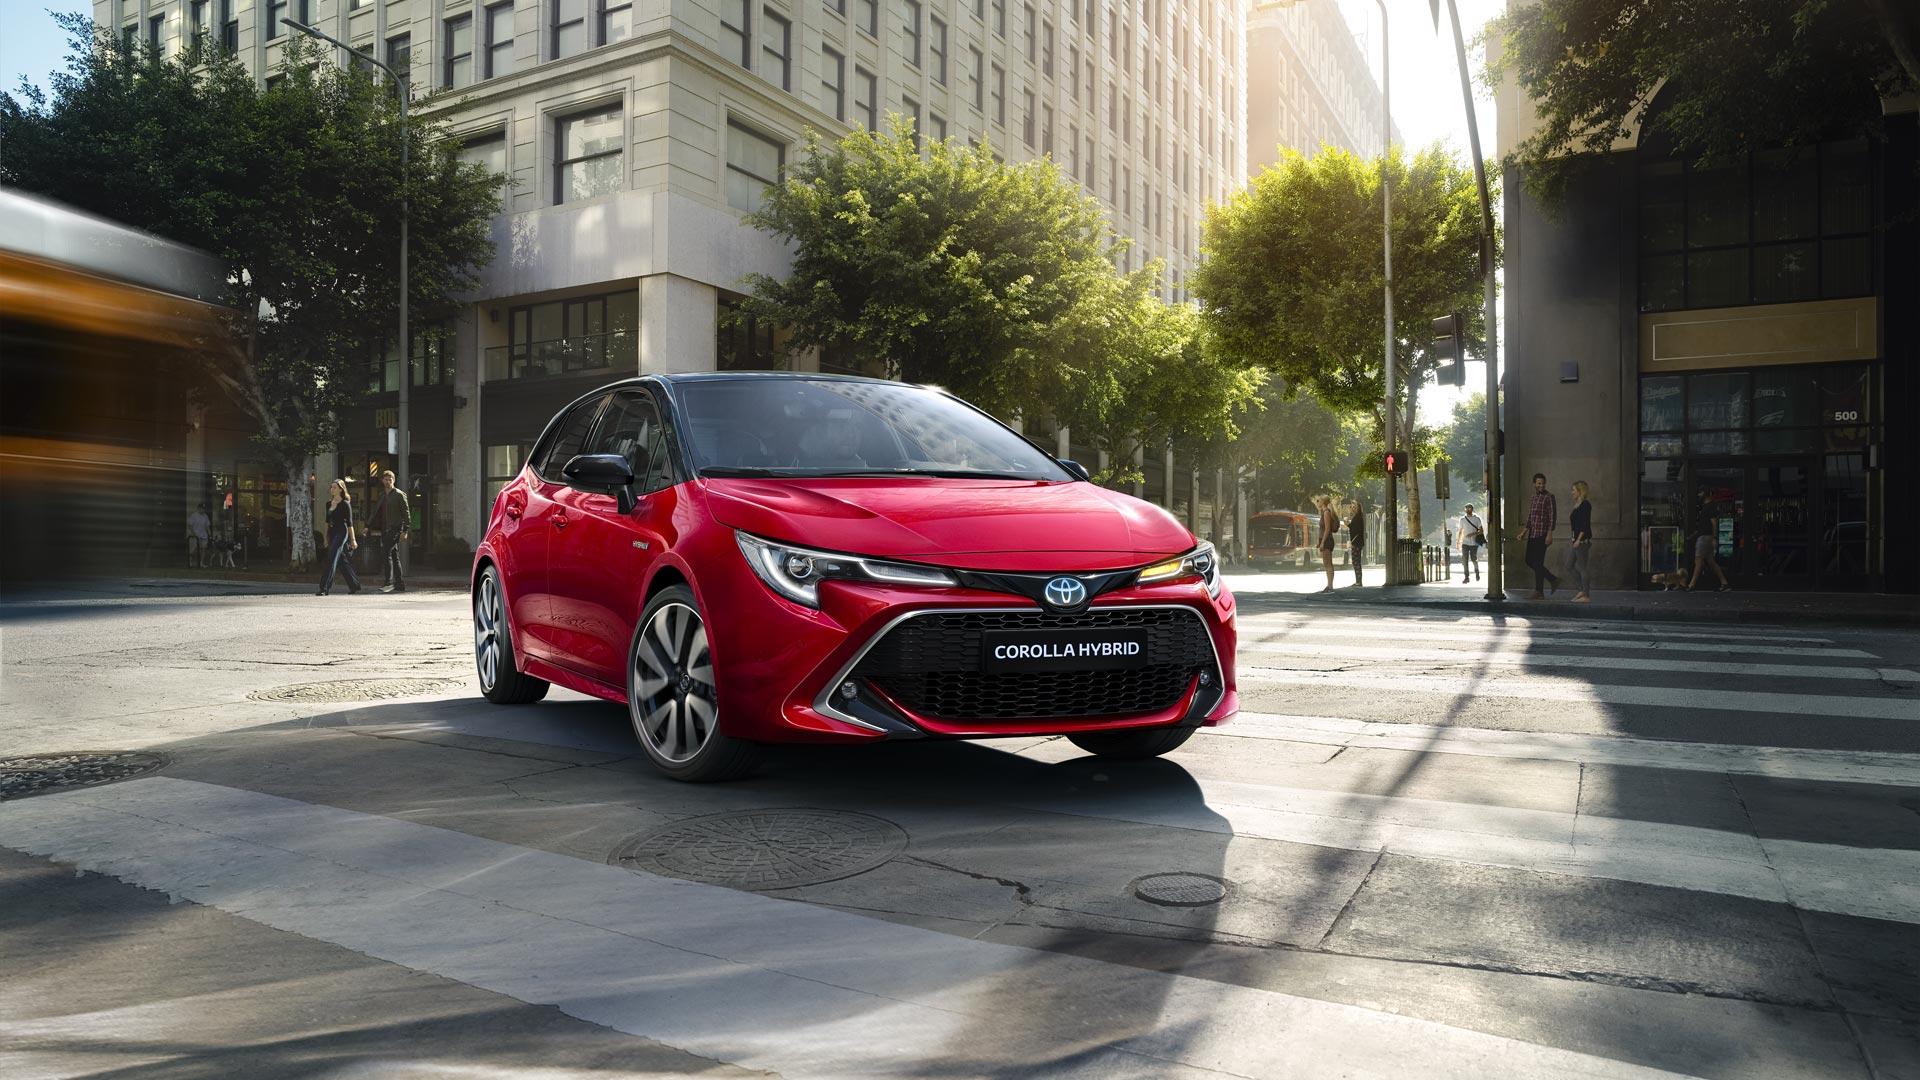 Nuevo Toyota Corolla Hybrid 2019 en Galicia